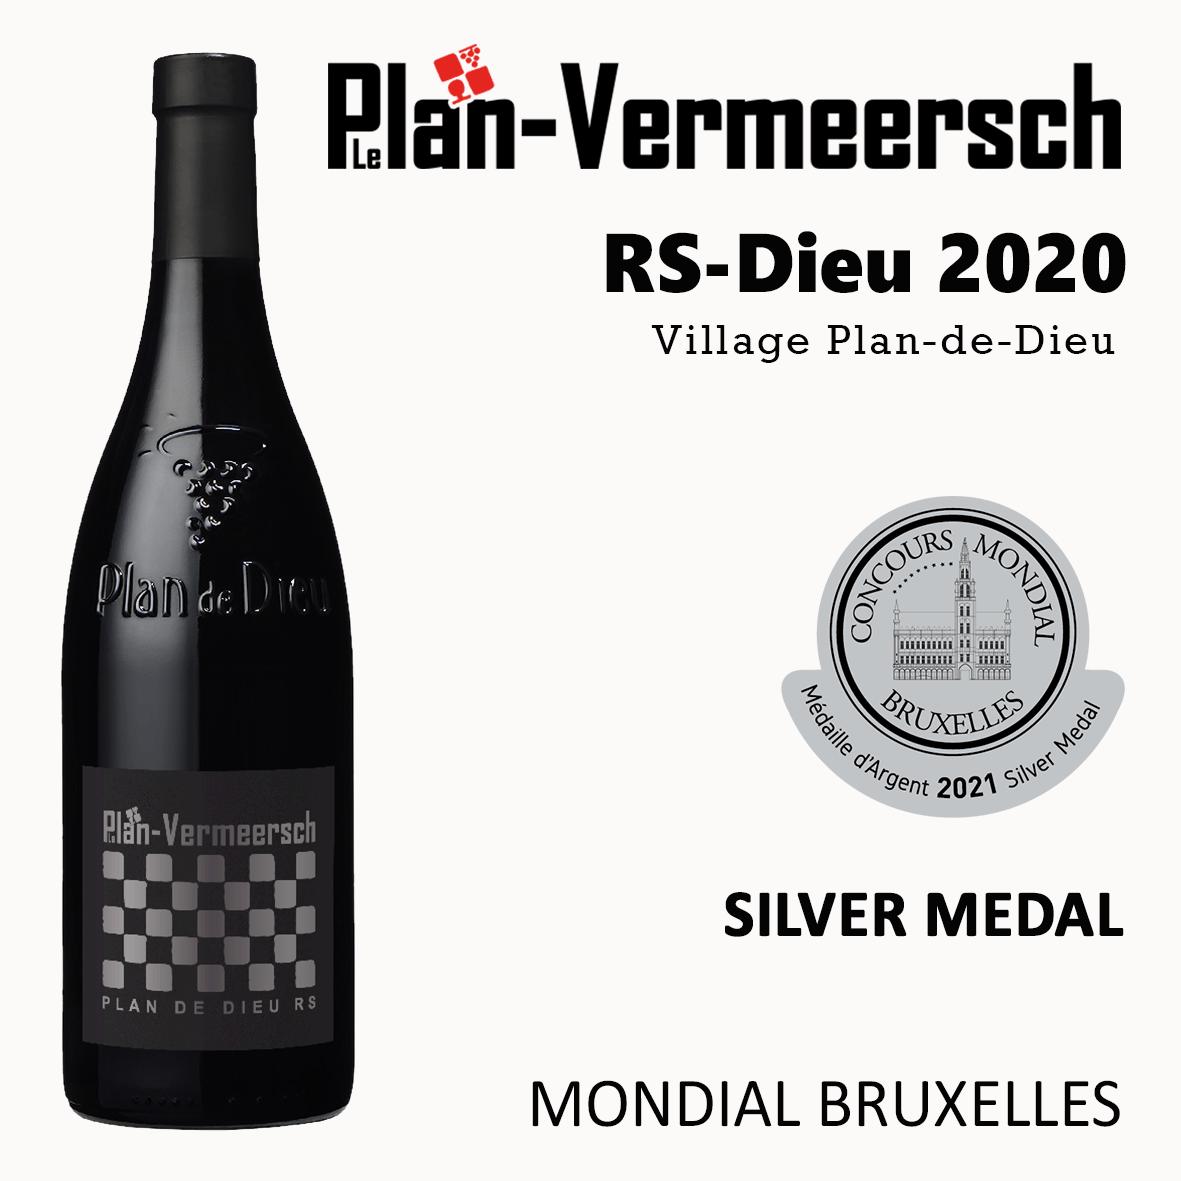 Bottle wine Syrah Grenache Mourvedre RS-Dieu Silver Medal Mondial Bruxelles LePLan-Vermersch